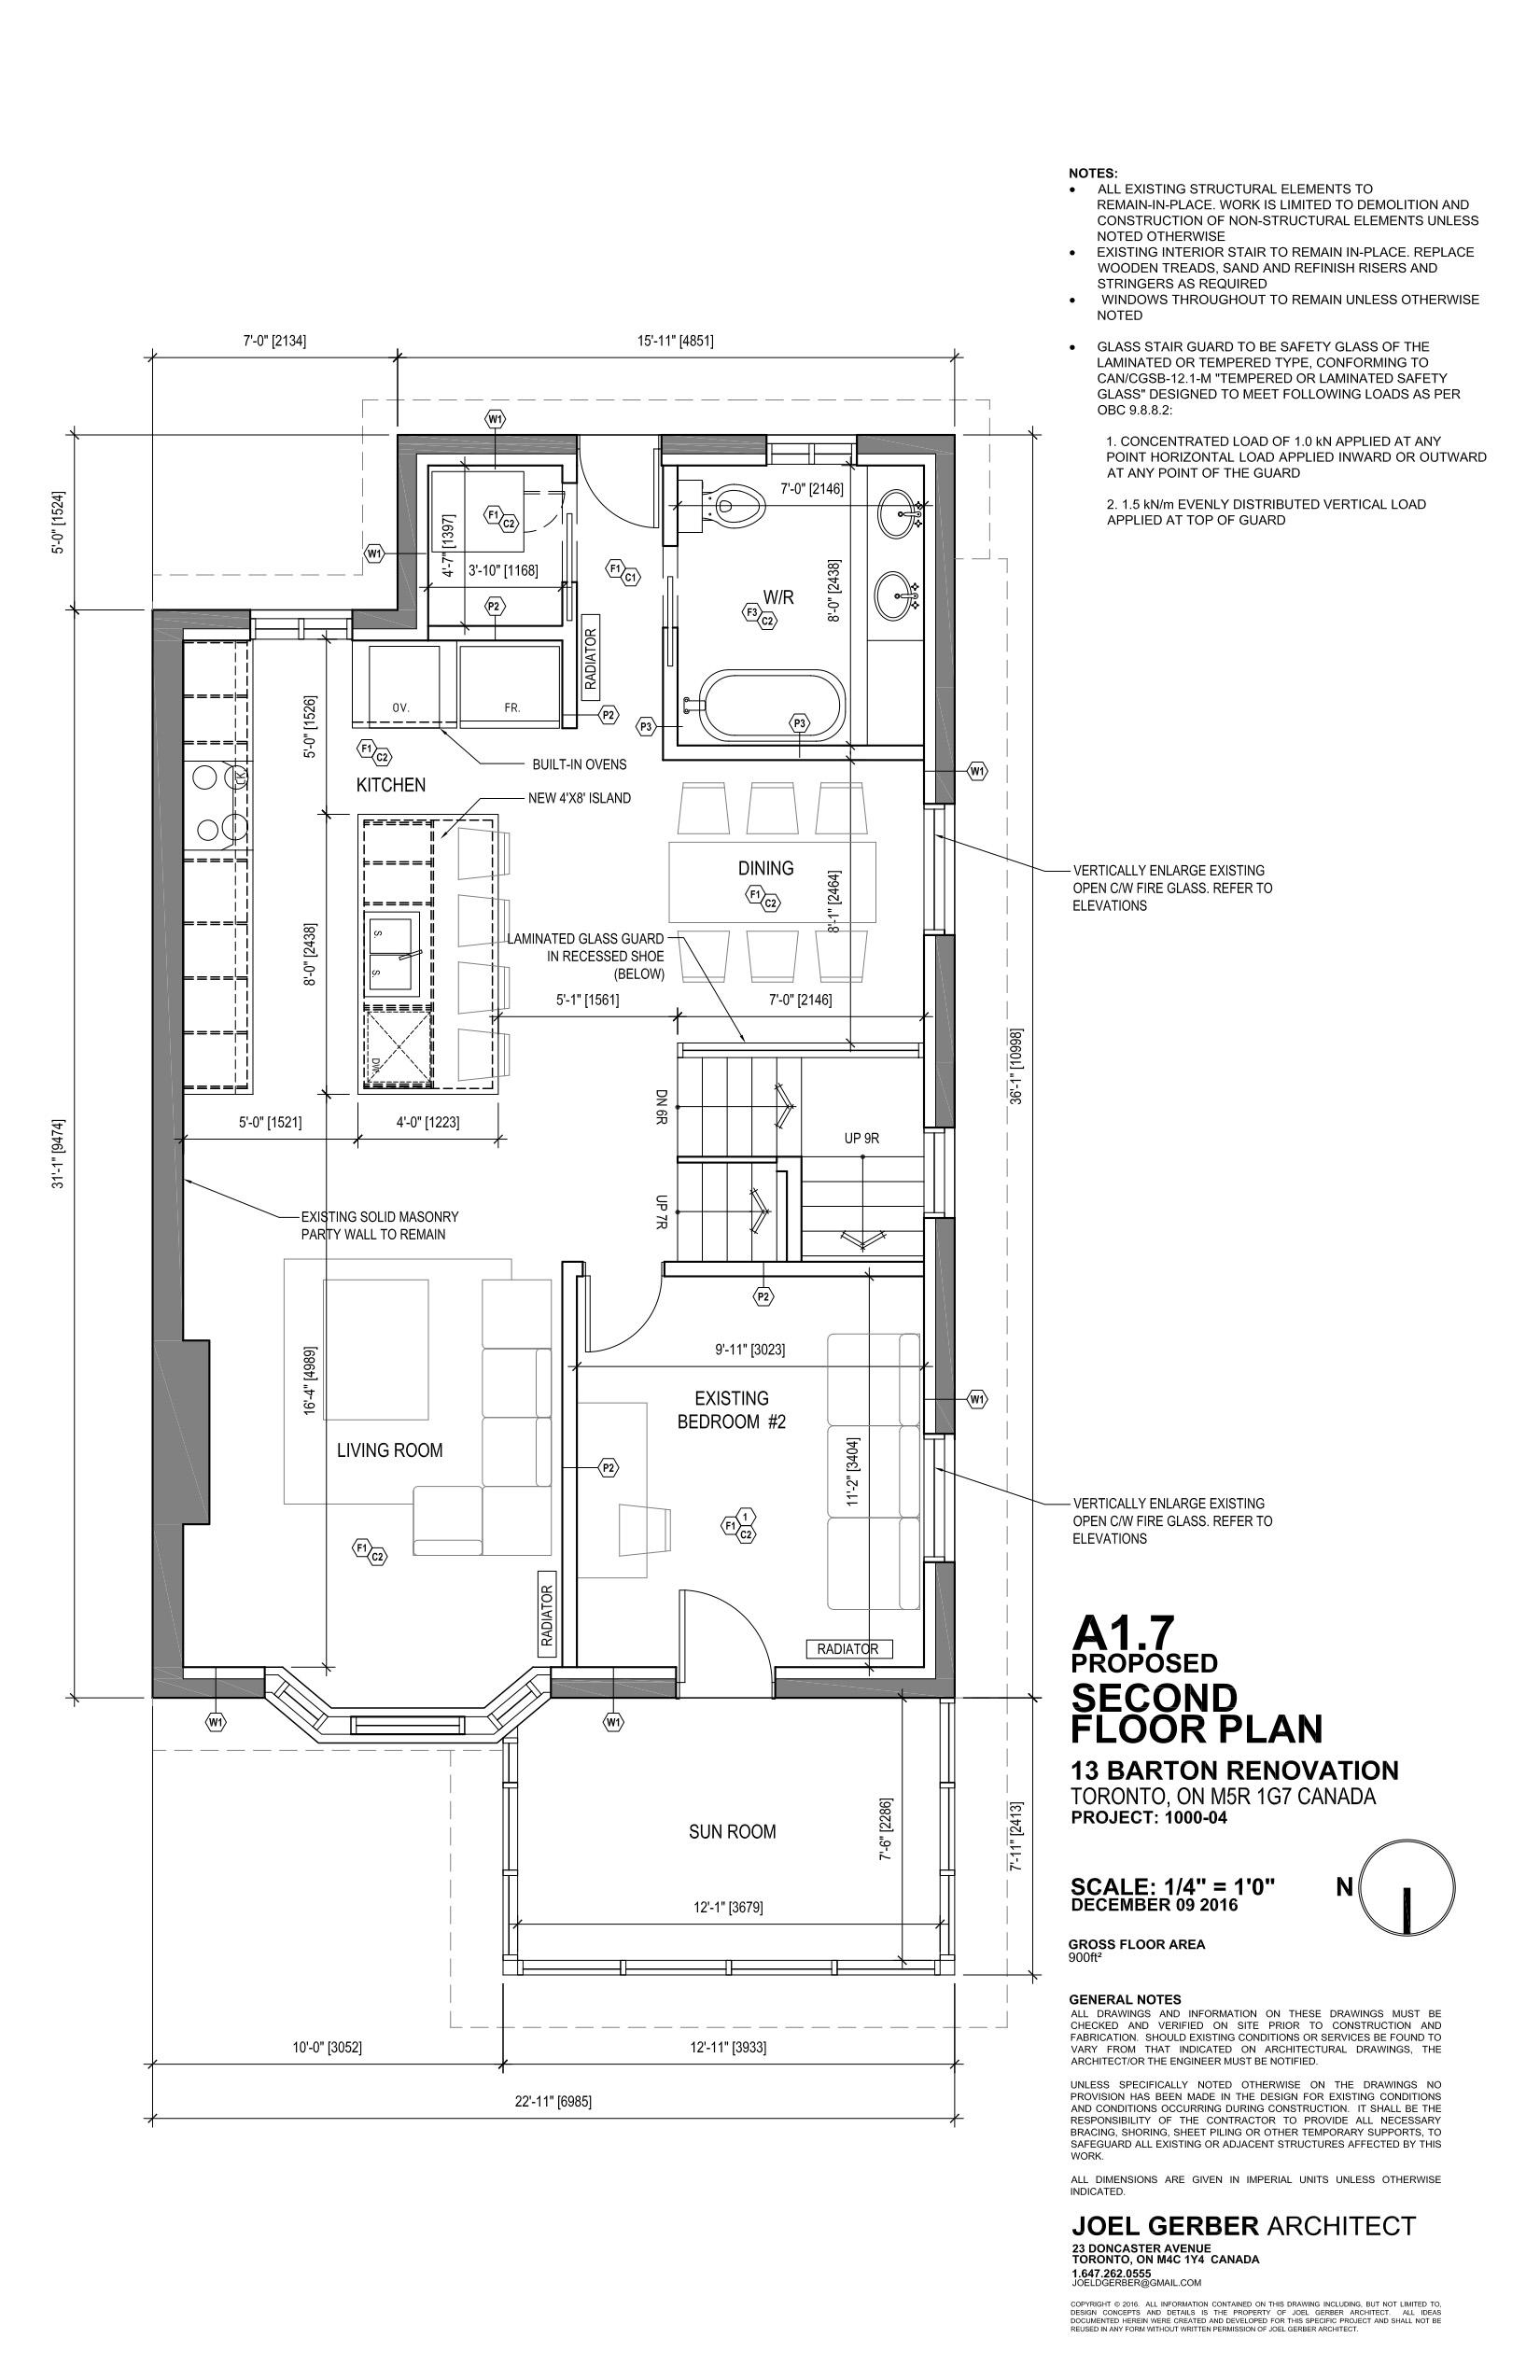 Drawing, Second Floor